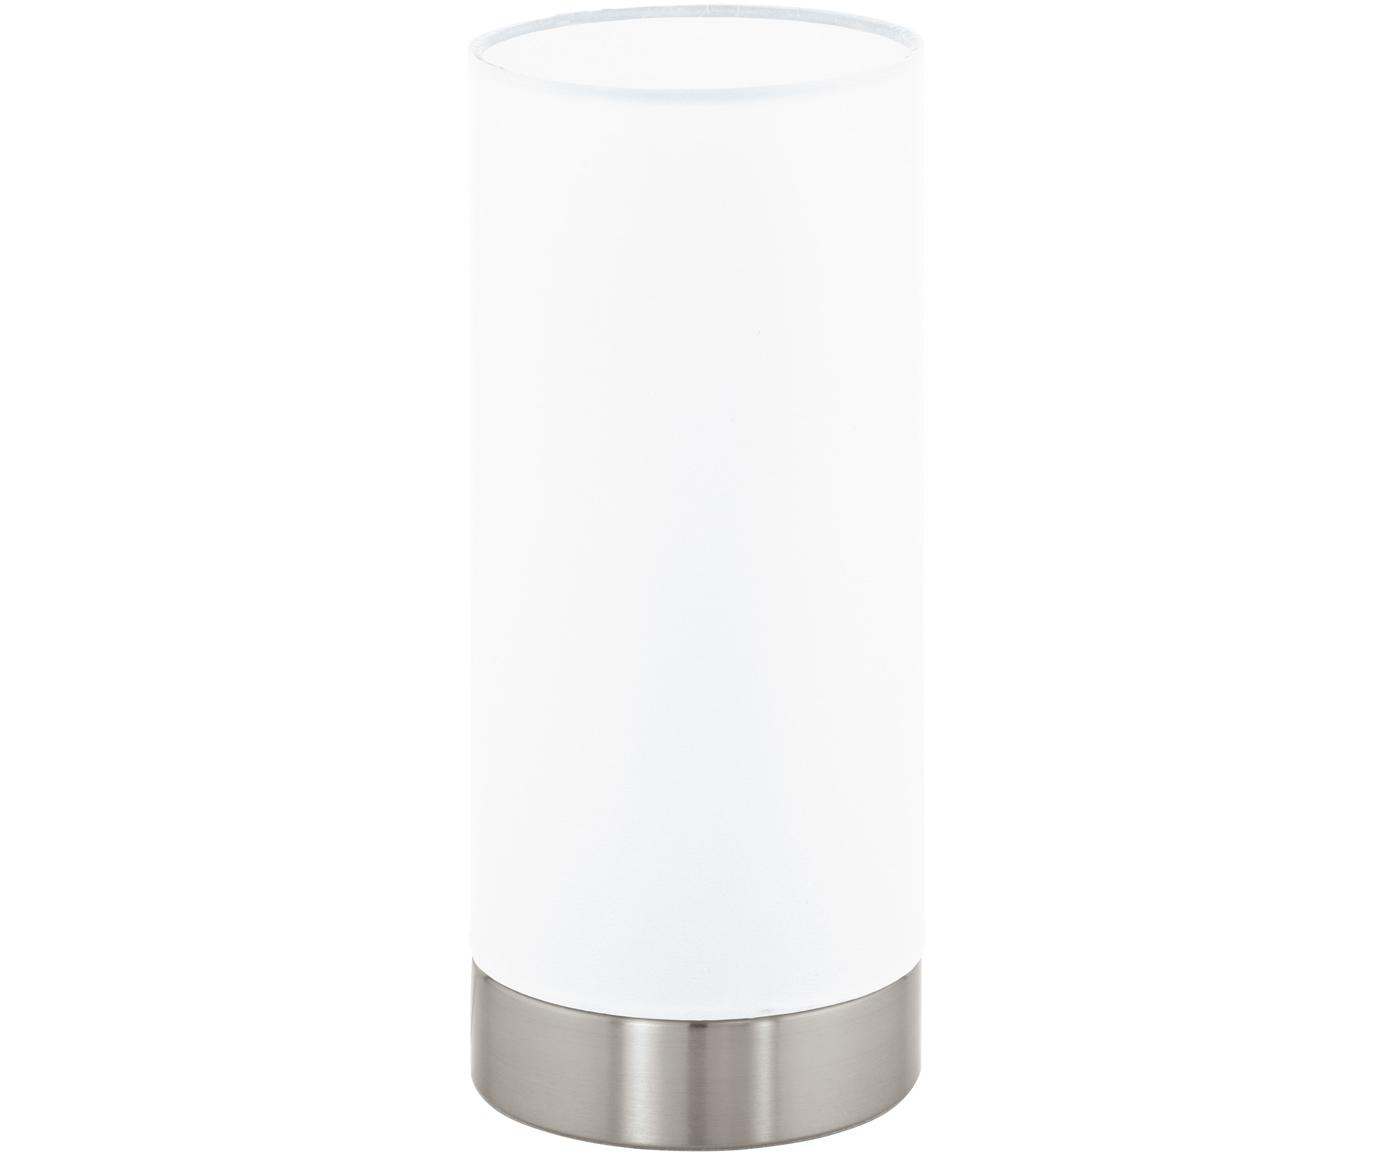 Dimbare tafellamp Pasteri, Lampenkap: polyester, Lampvoet: vernikkeld staal, Wit, nikkelkleurig, Ø 12 x H 26 cm